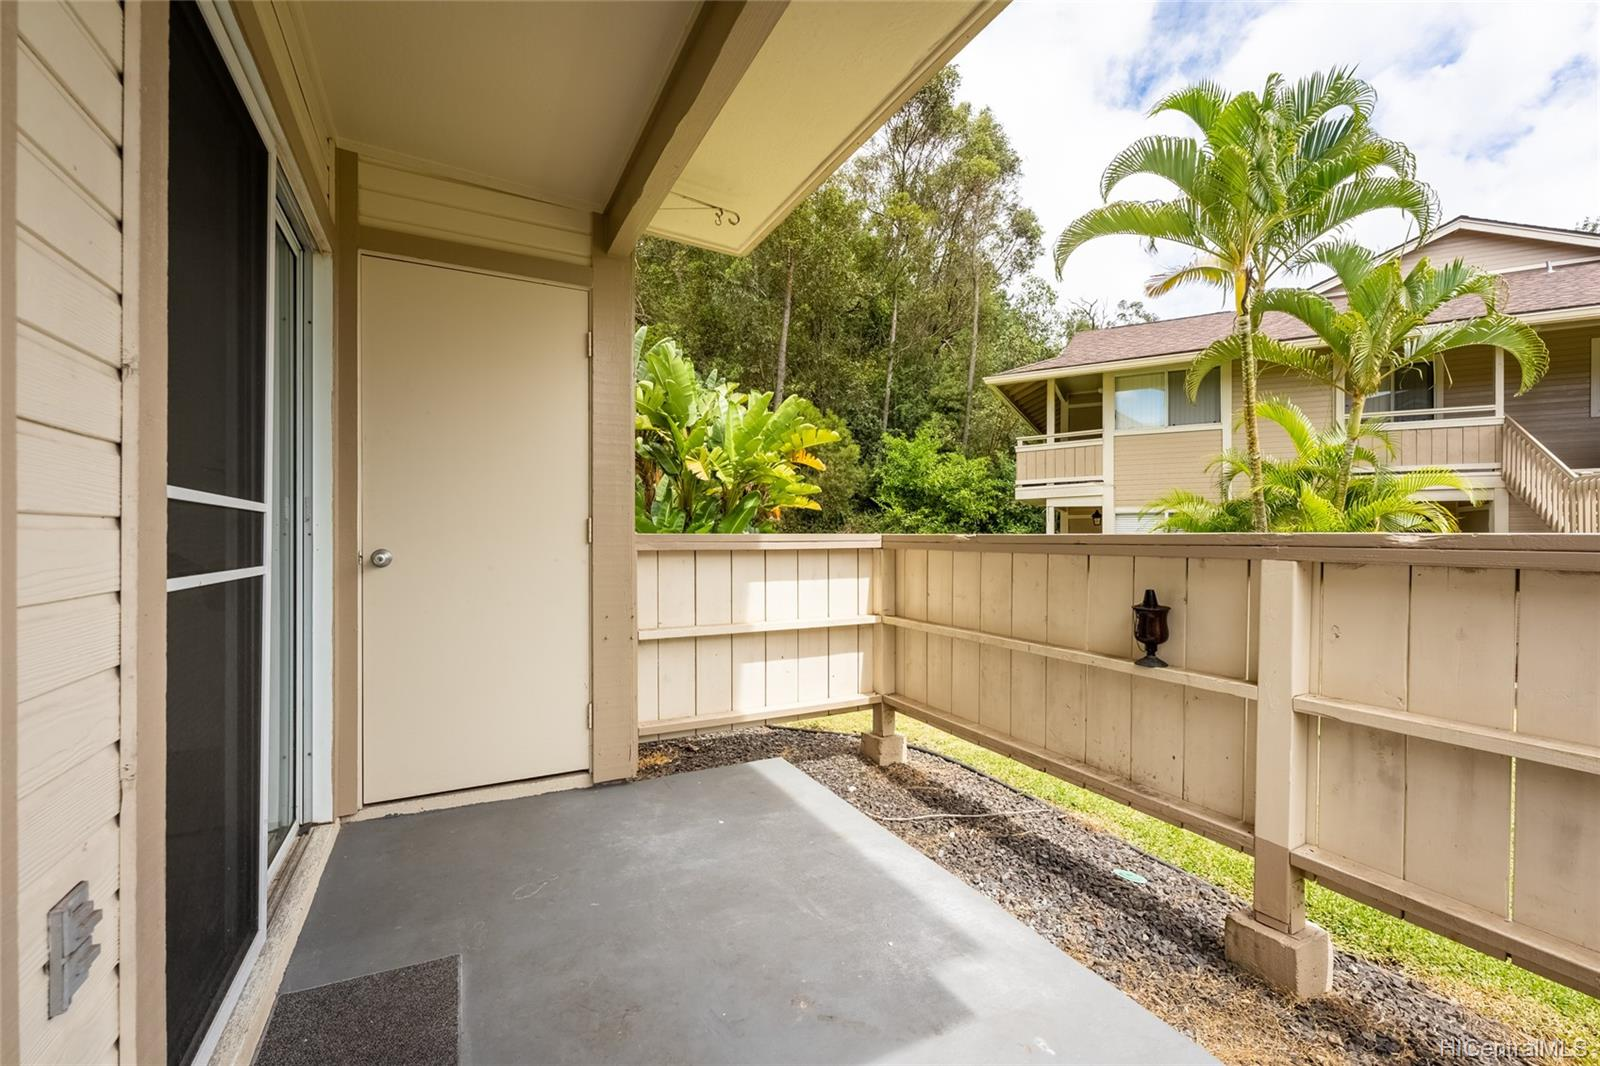 95-510 Wikao Street townhouse # M106, Mililani, Hawaii - photo 17 of 18